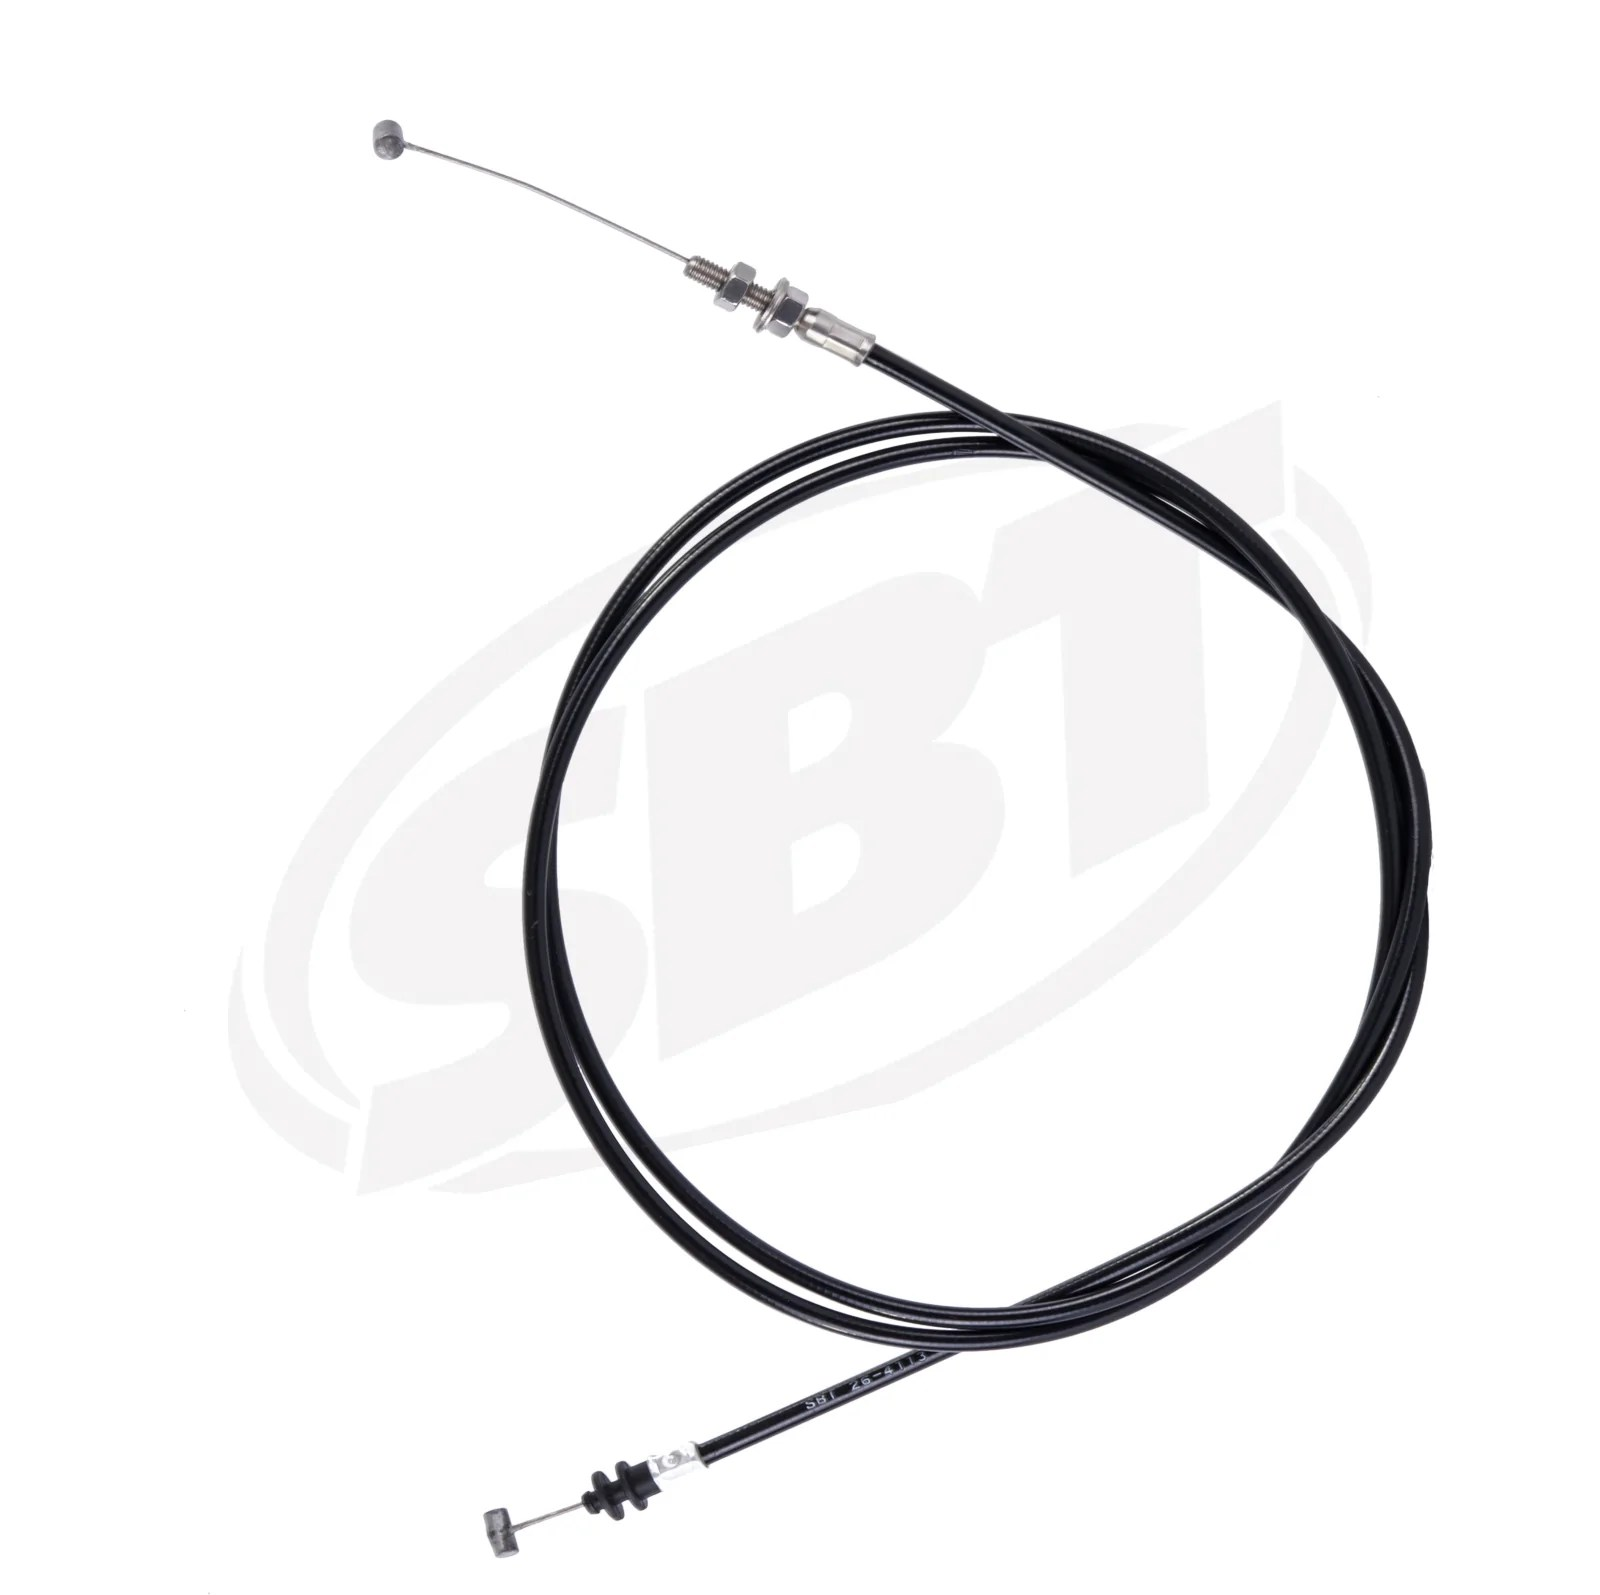 SBT Sea-Doo Throttle Cable XP 800 /XP /SPX 277000468 1995